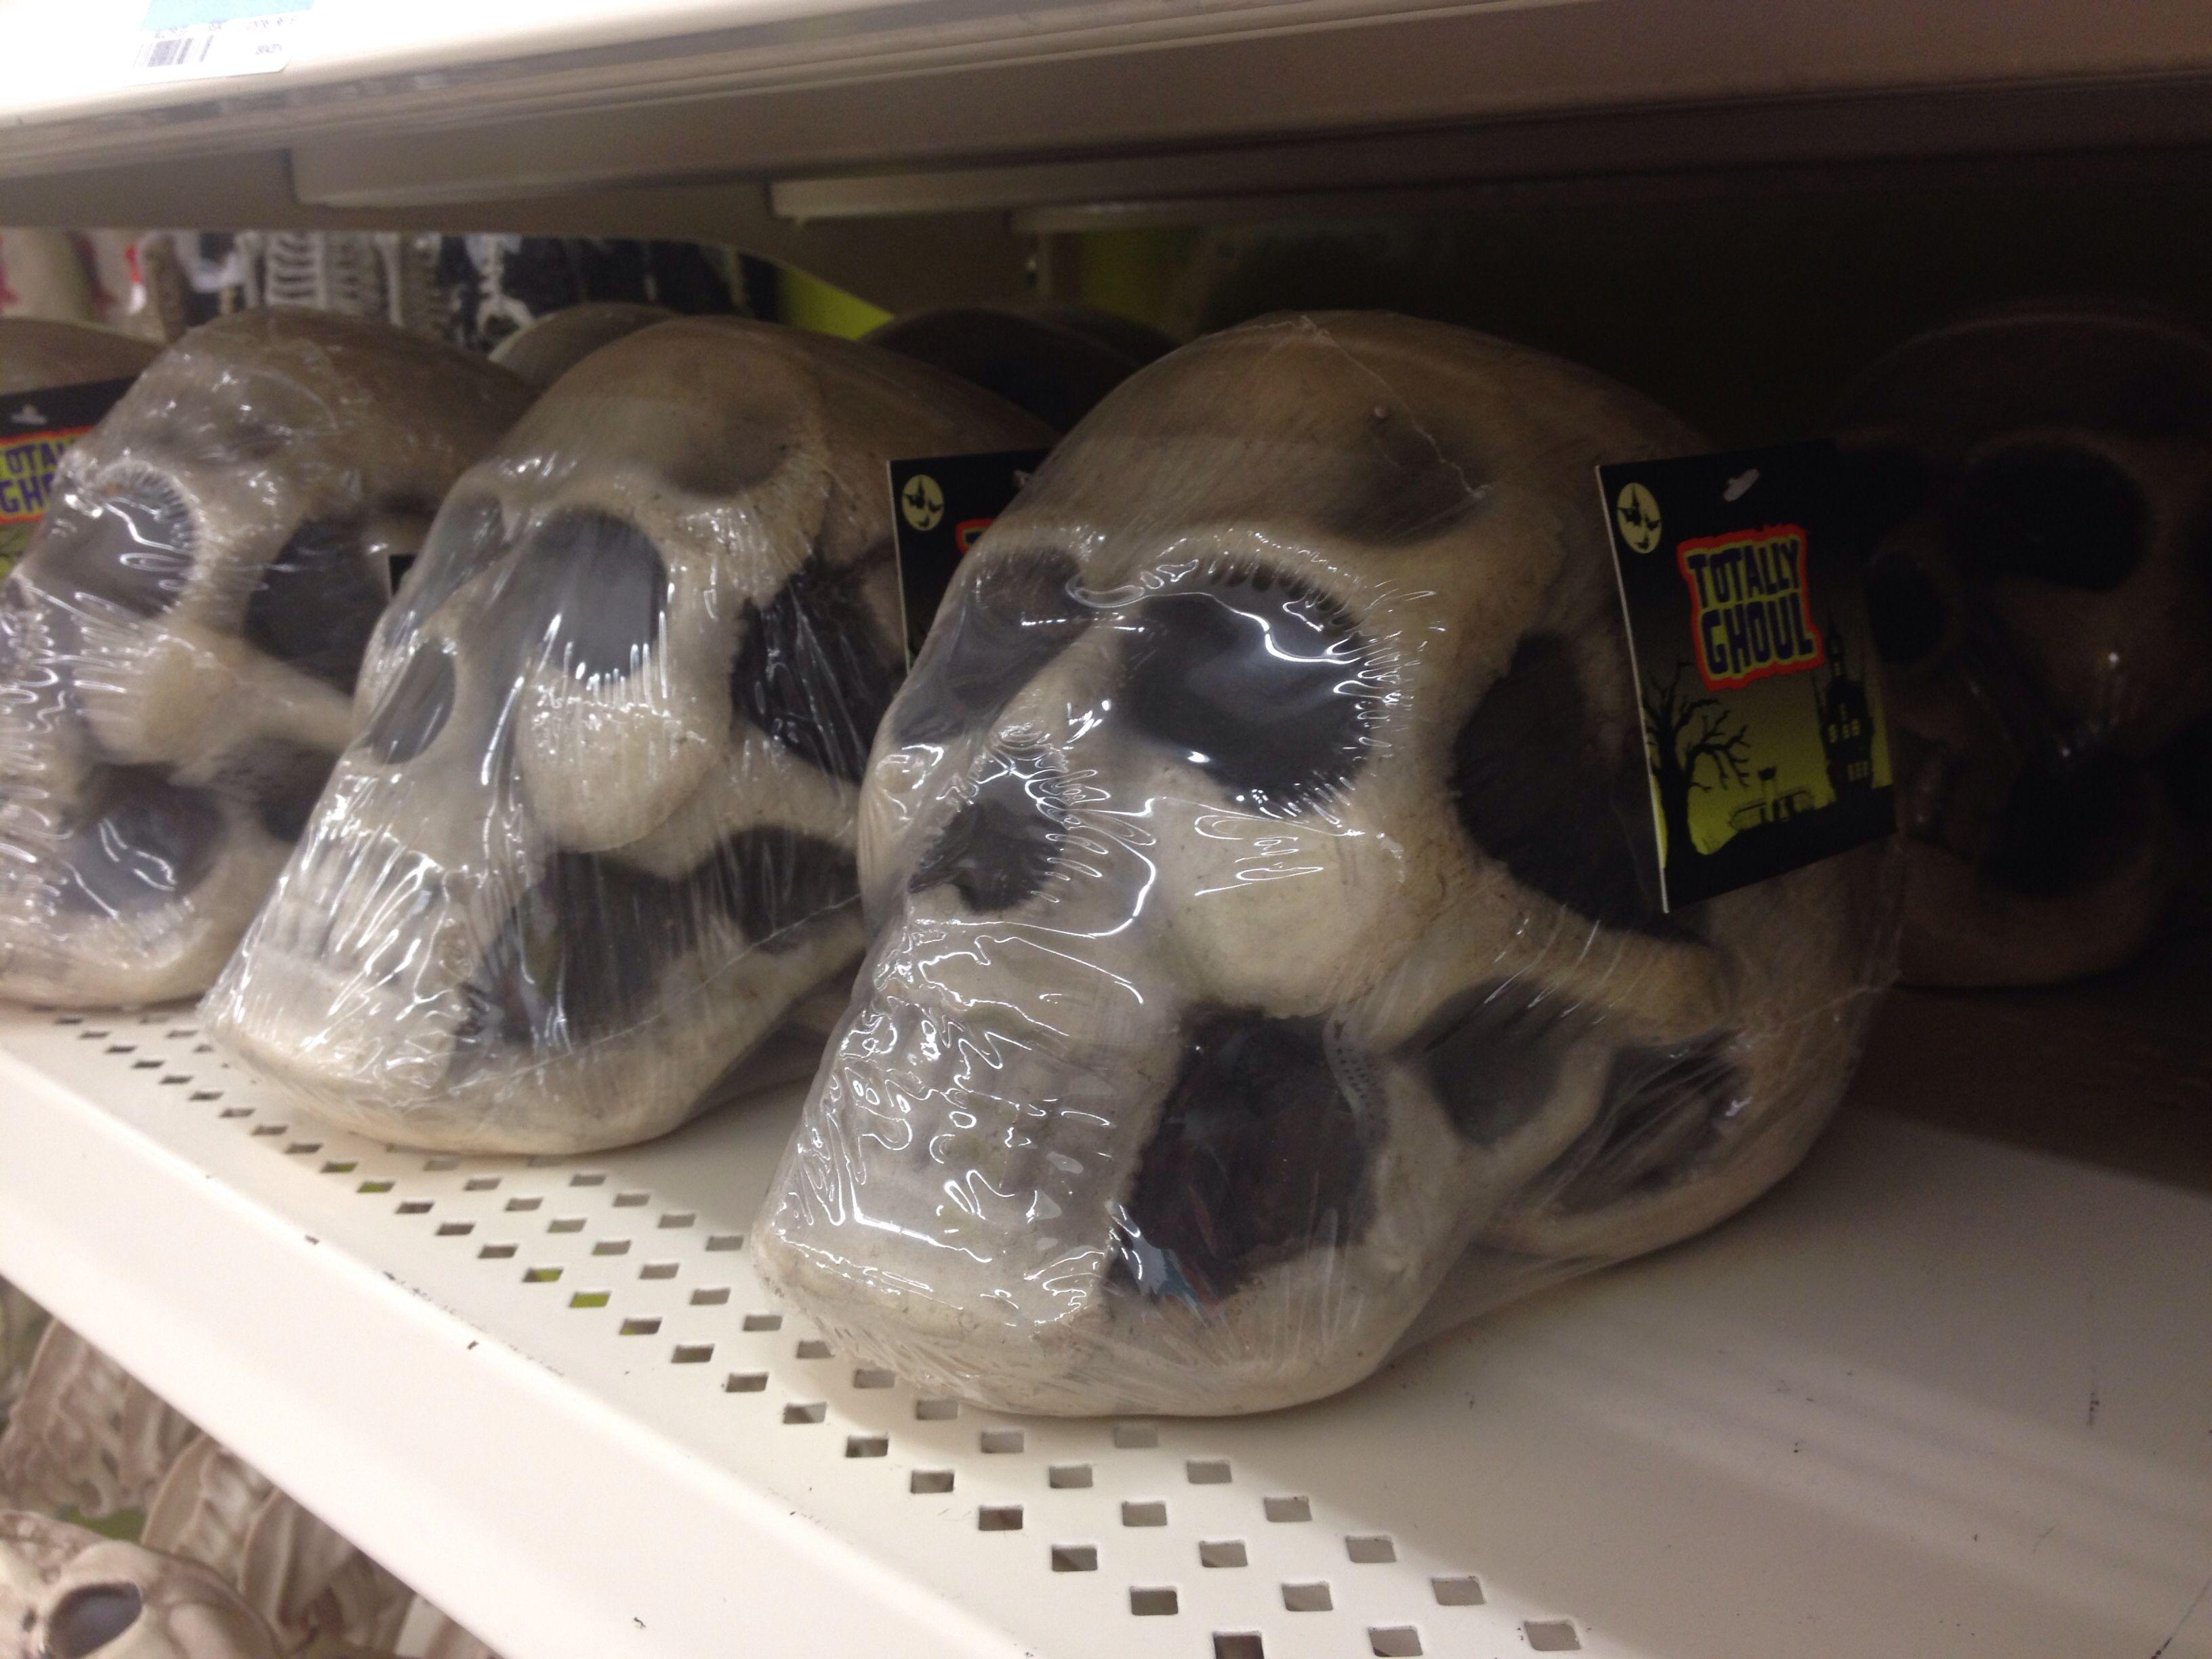 foam skulls at kmart halloween decorations halloween shopping foam skulls at kmart halloween decorations halloween shopping - Kmart Halloween Decorations